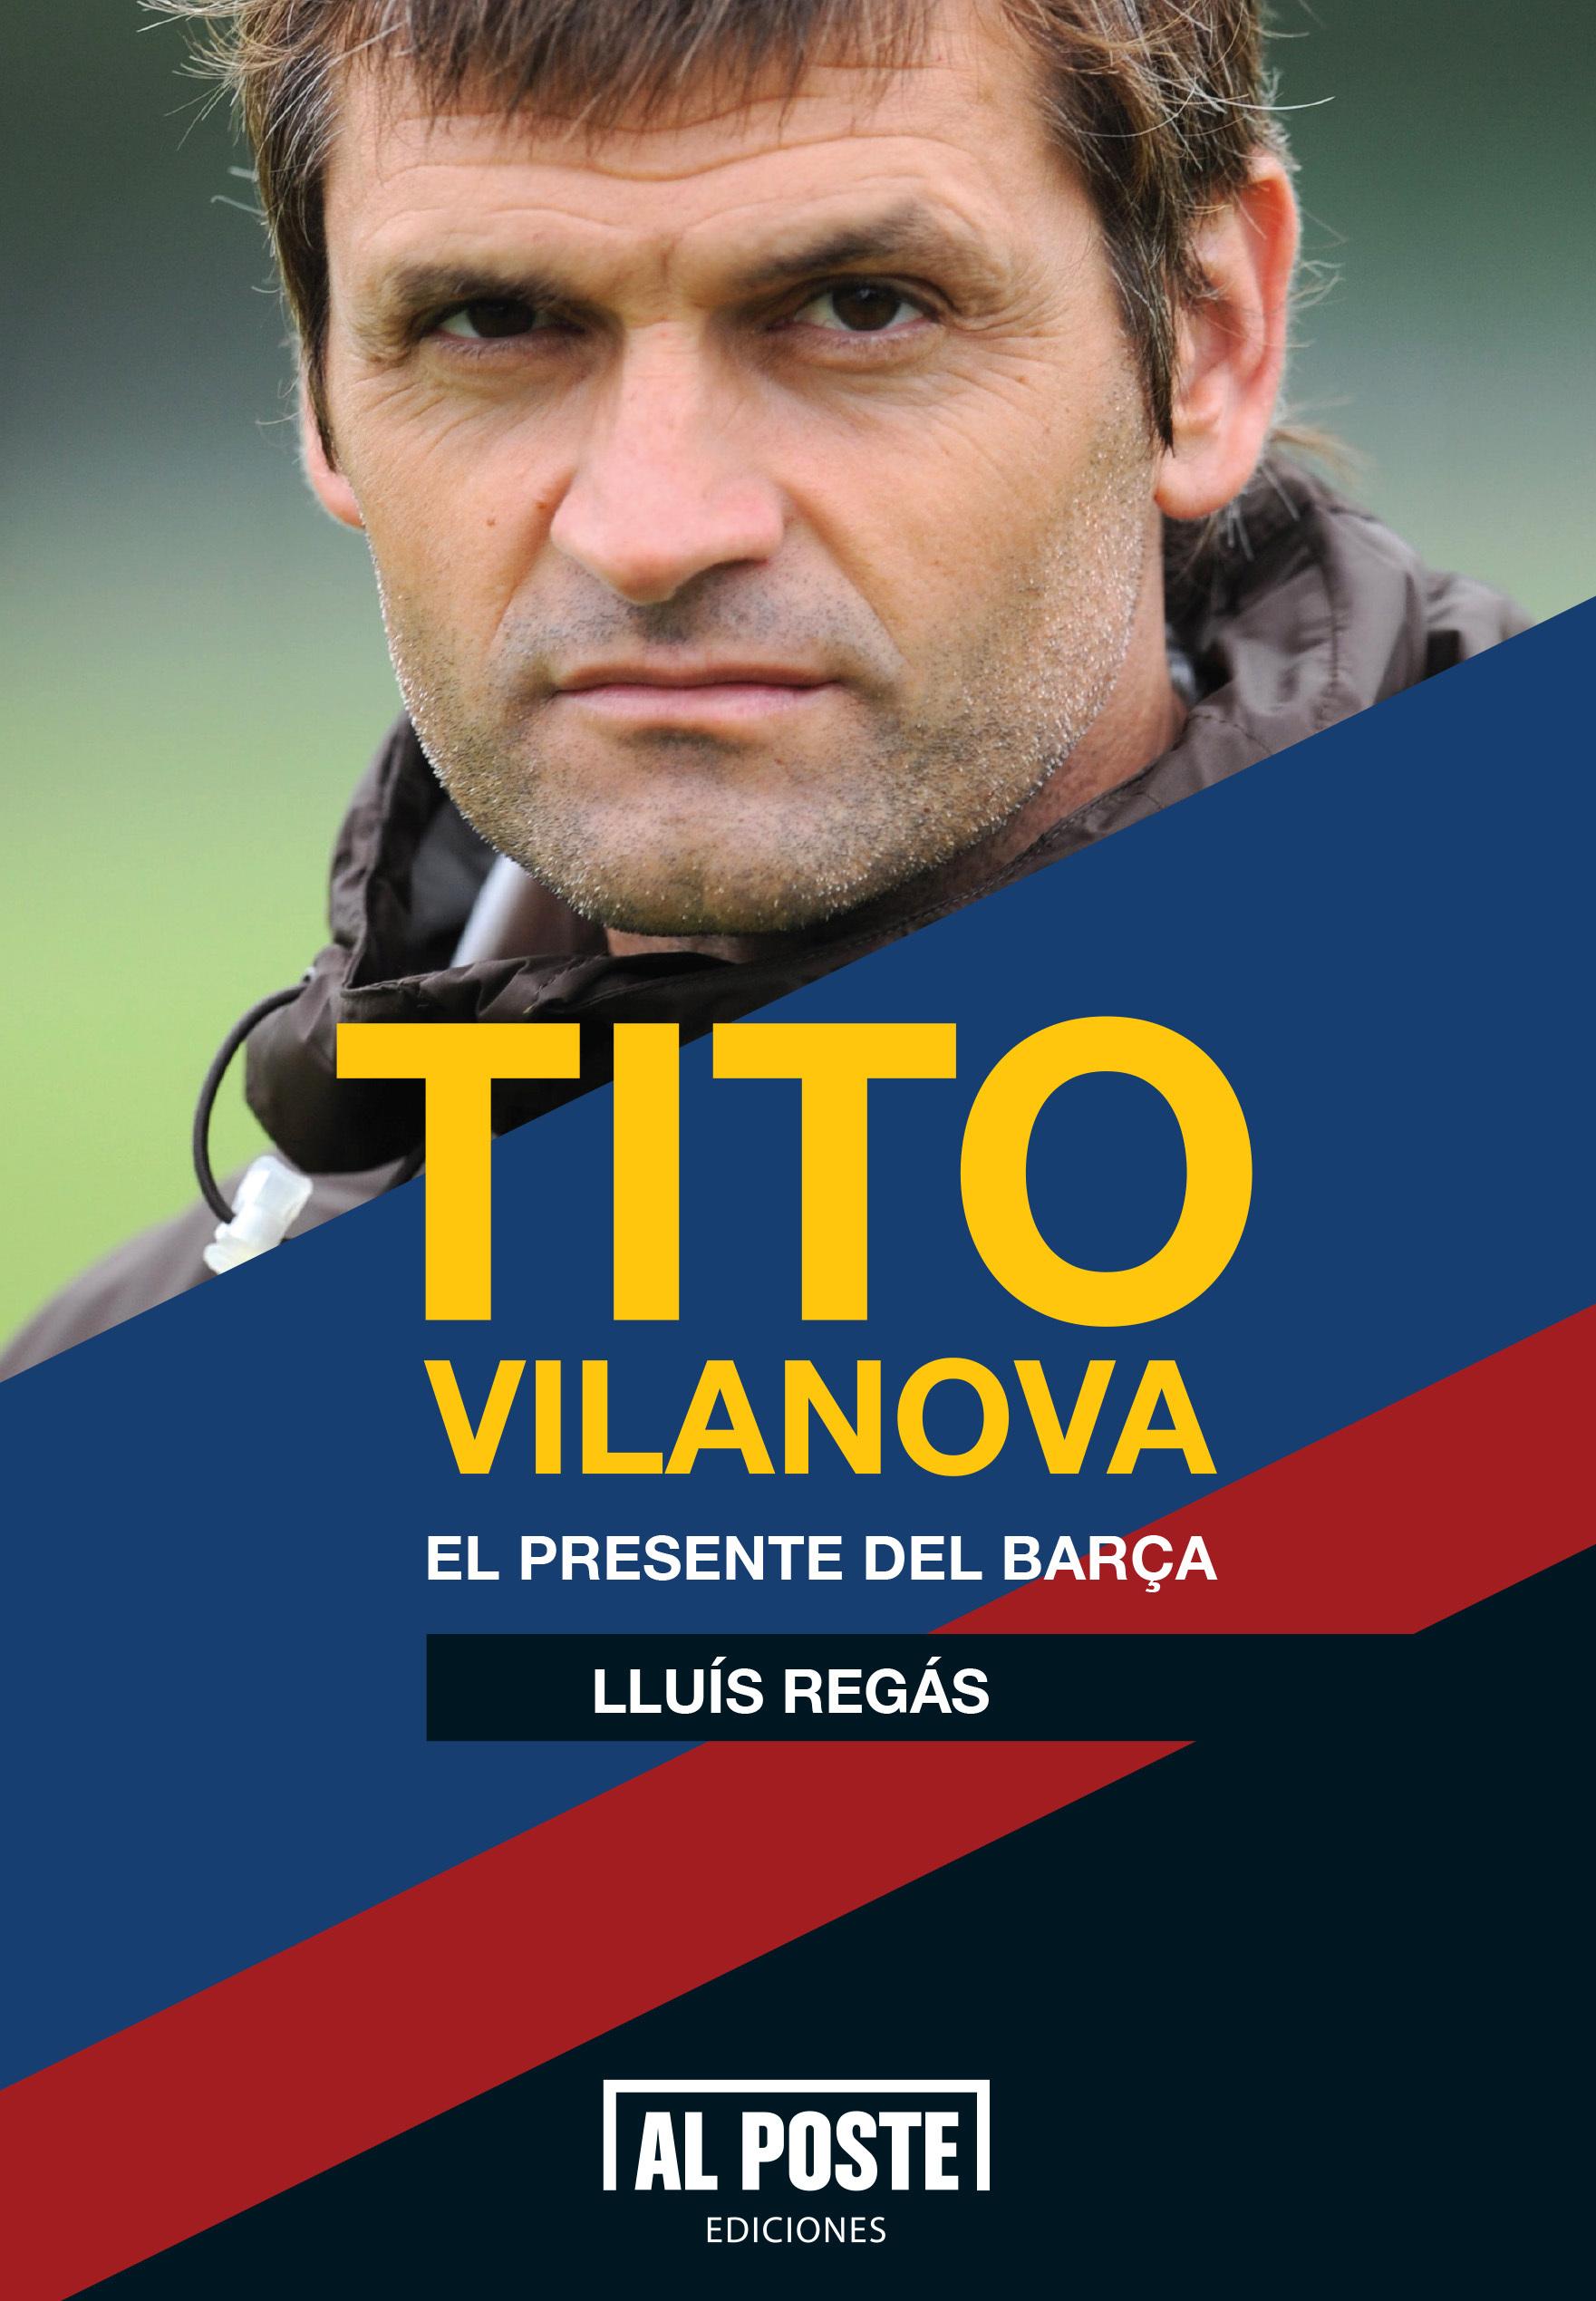 TITO VILANOVA: EL PRESENTE DEL BARÇA